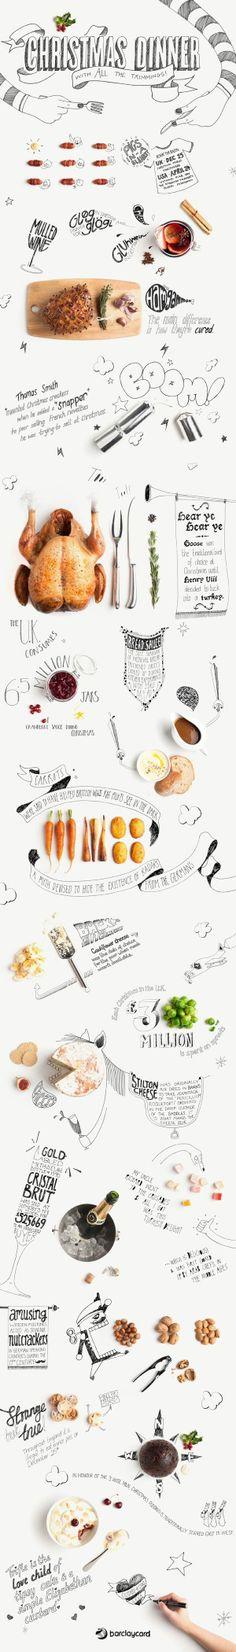 Gonzalo Azores X Barclaycard | Trendland: Design Blog & Trend Magazine